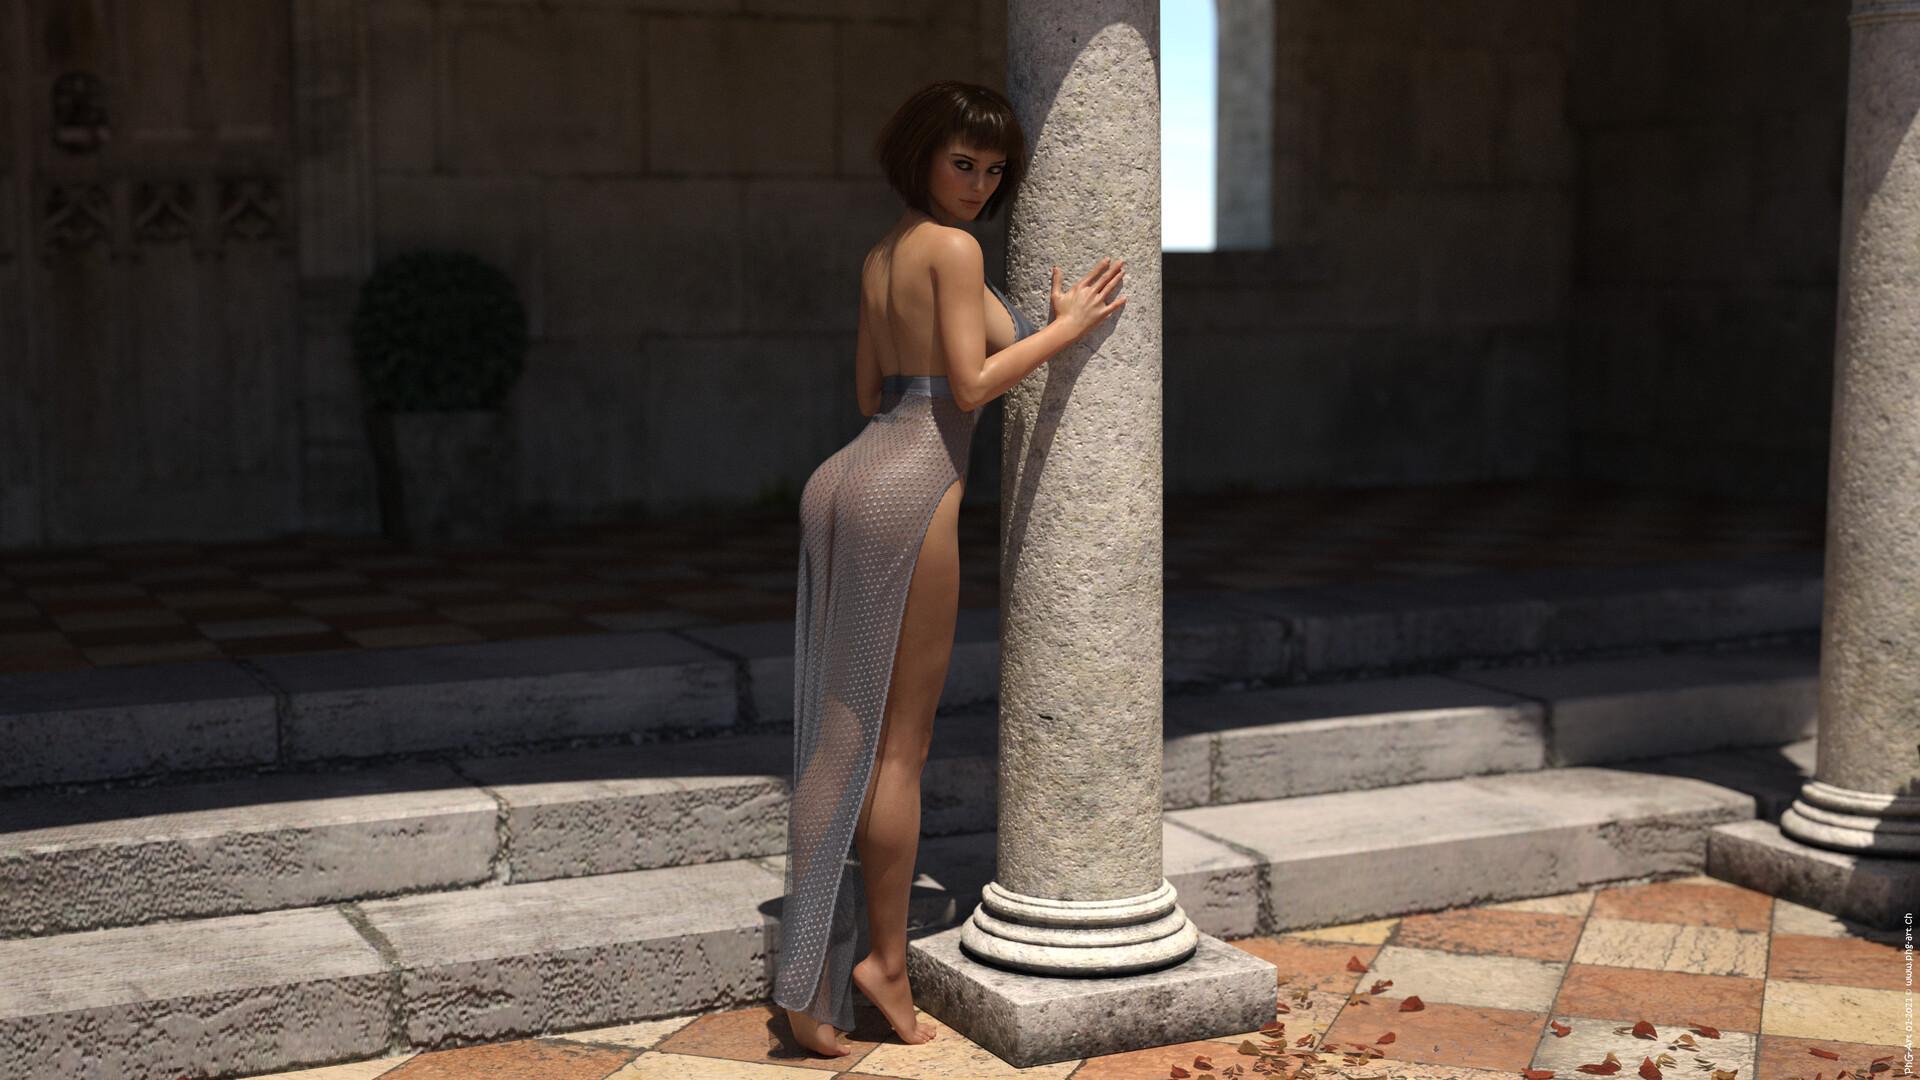 https://cdna.artstation.com/p/assets/images/images/033/530/484/large/philippe-gerber-renaissance-f.jpg